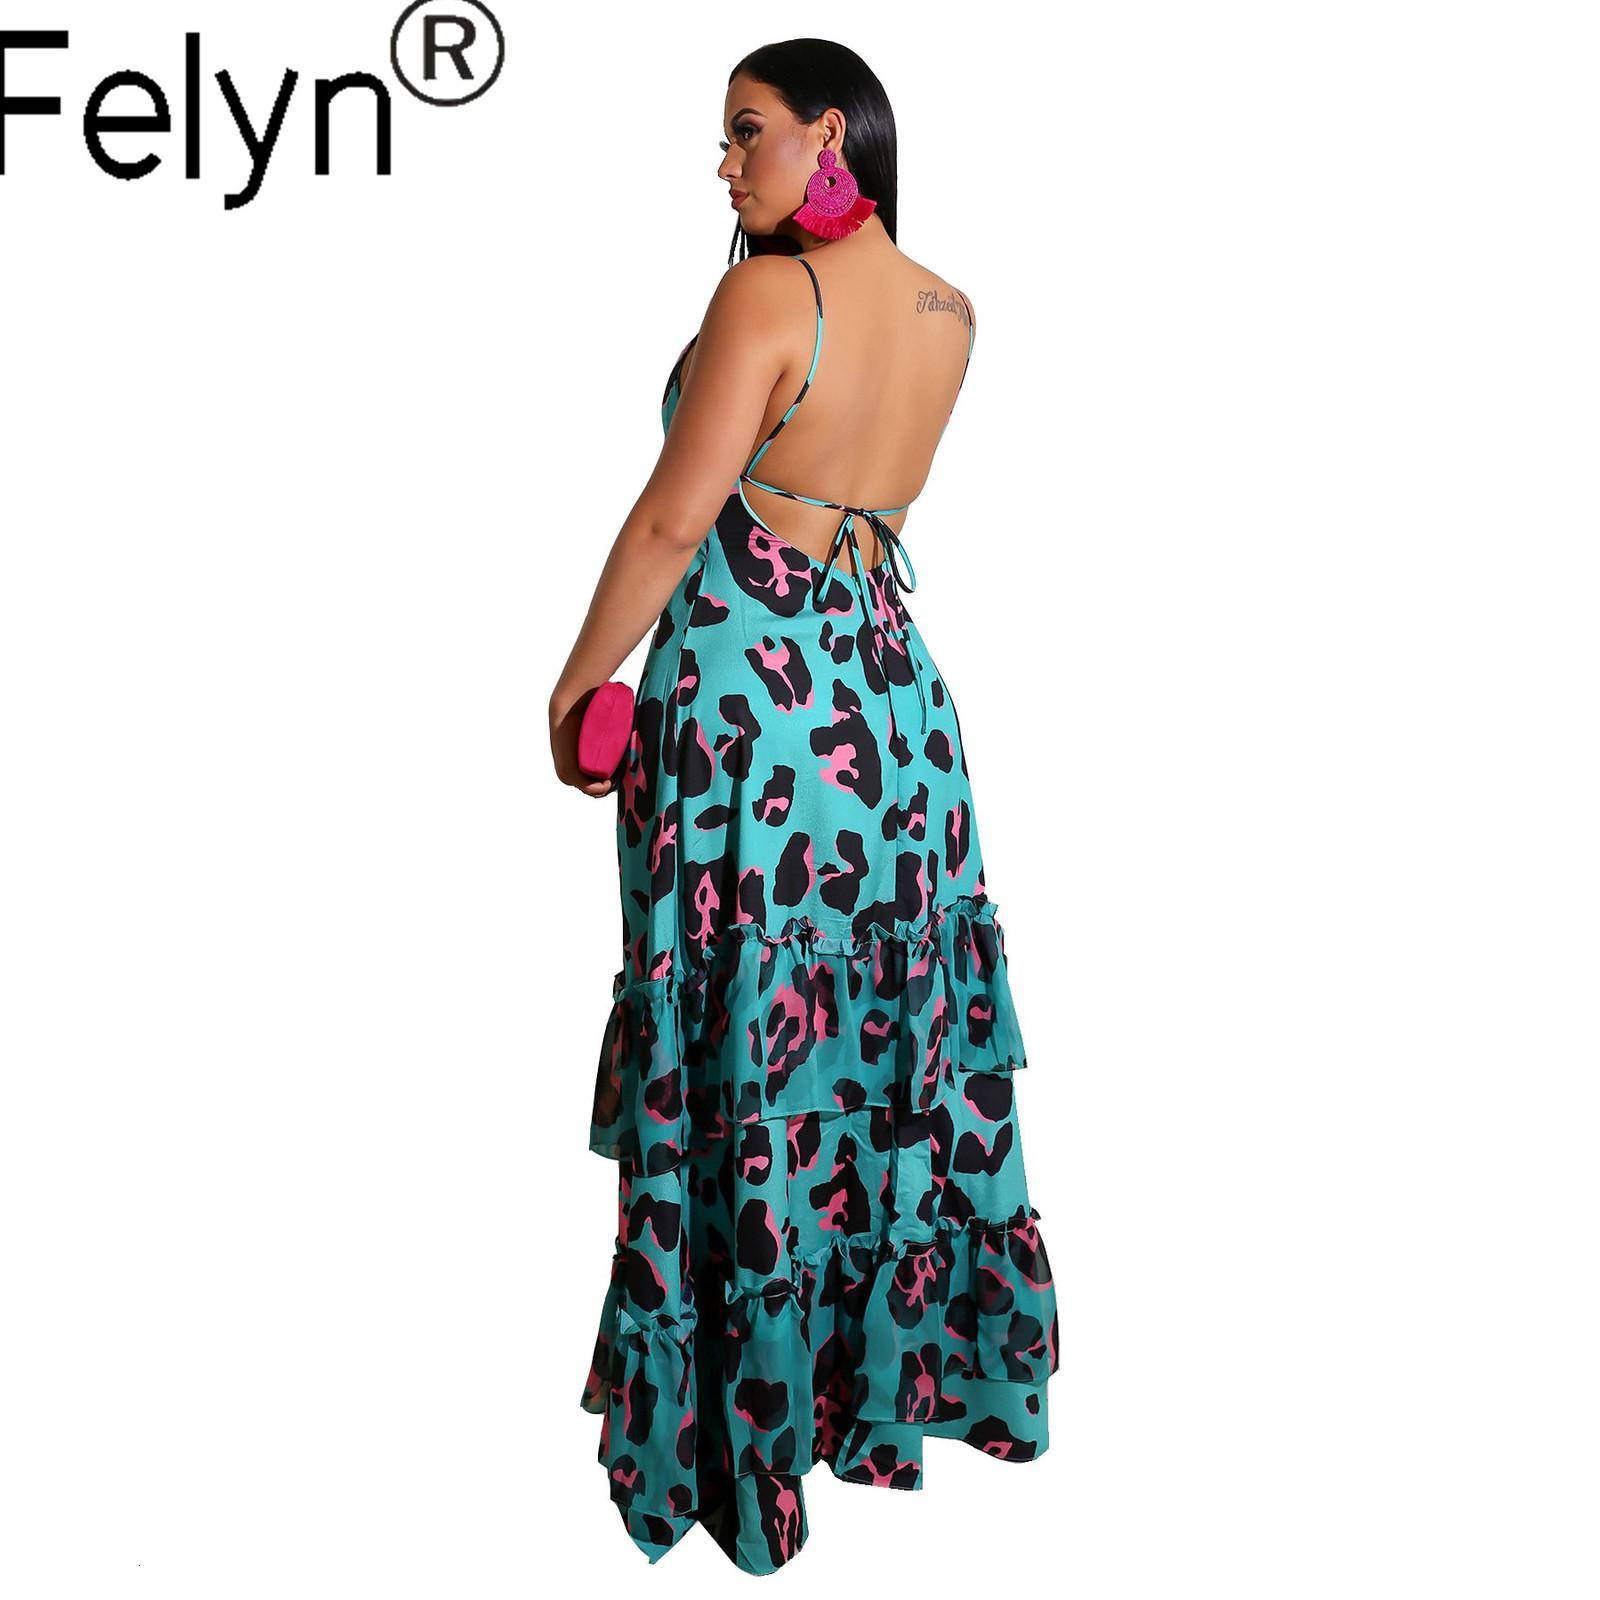 Multi Print Dress, High Quality, Famous Brand, Spaghetti Shoulder Strap, Skirt, Summer 2021, Bb076 Ya6p